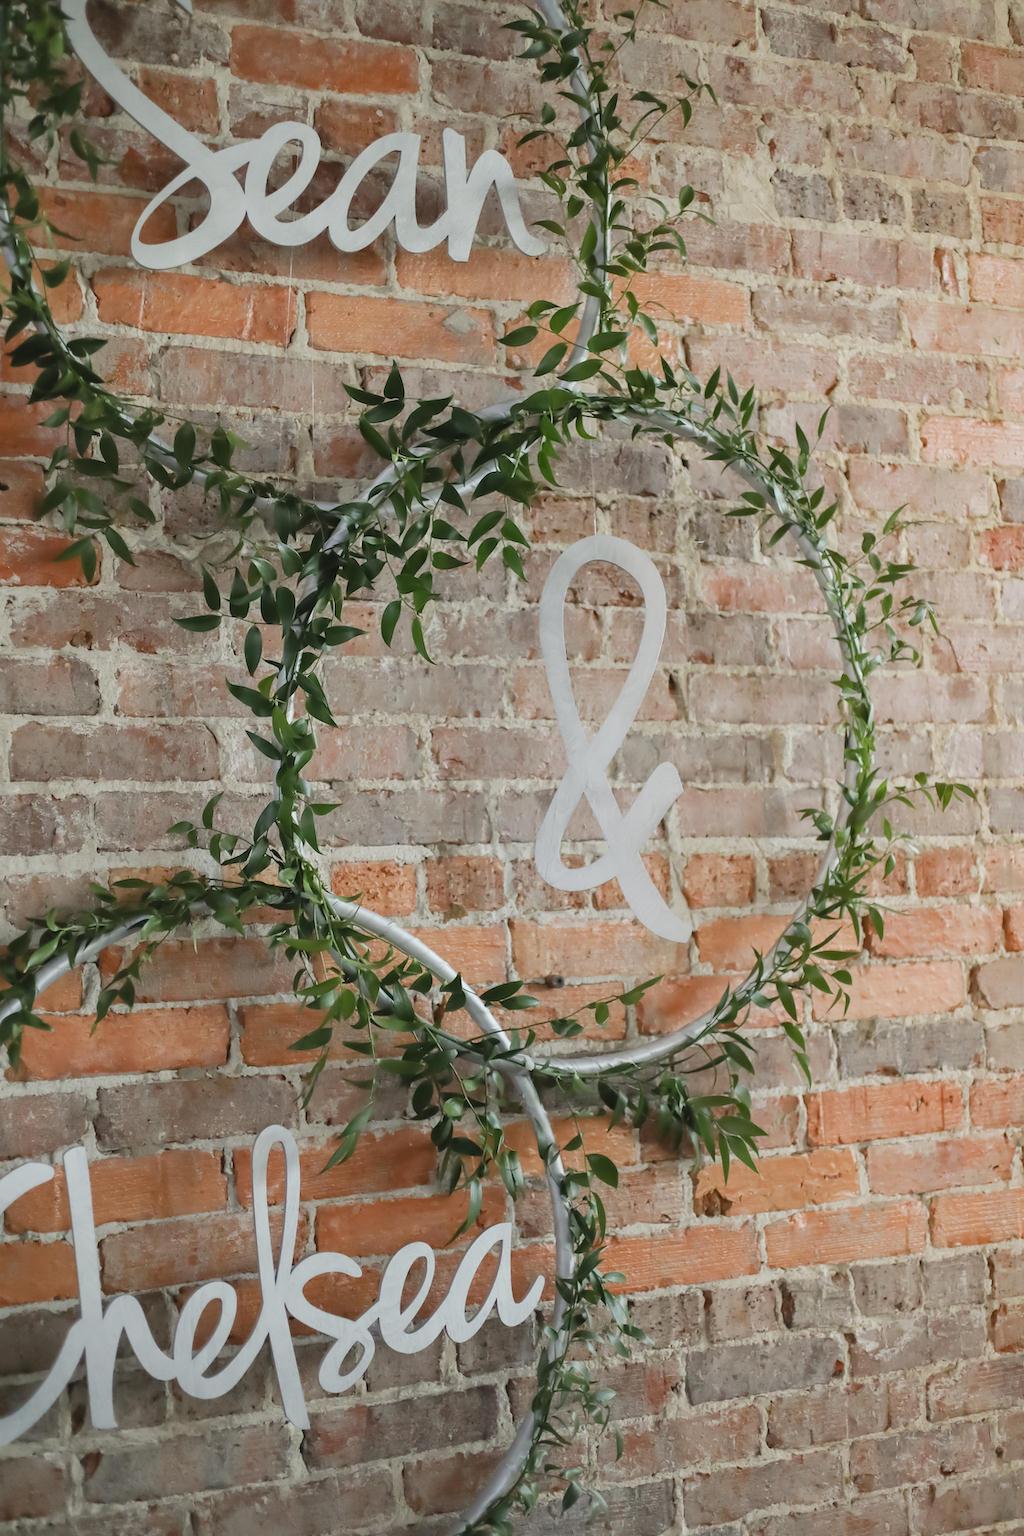 Industrial Wedding Decor Silver Metal Groom and Bride Laser Cut Names in Circular Hoops with Greenery Garland   Tampa Bay Wedding Photographer Lifelong Photography Studios